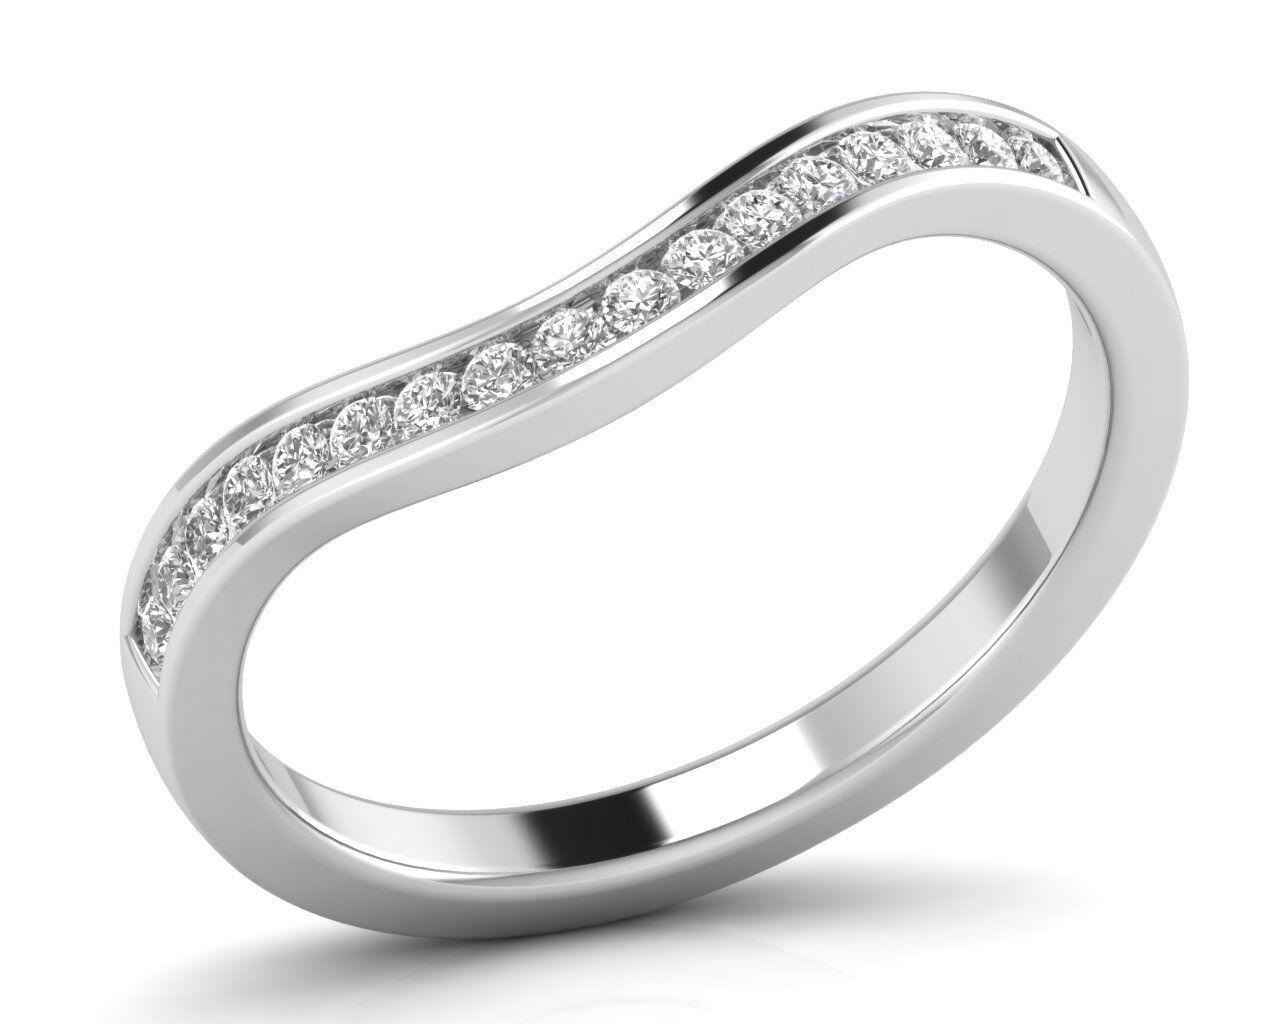 0.25 carat Round Brilliant Cut Diamonds Wishbone Shaped Wedding Ring in 18K gold